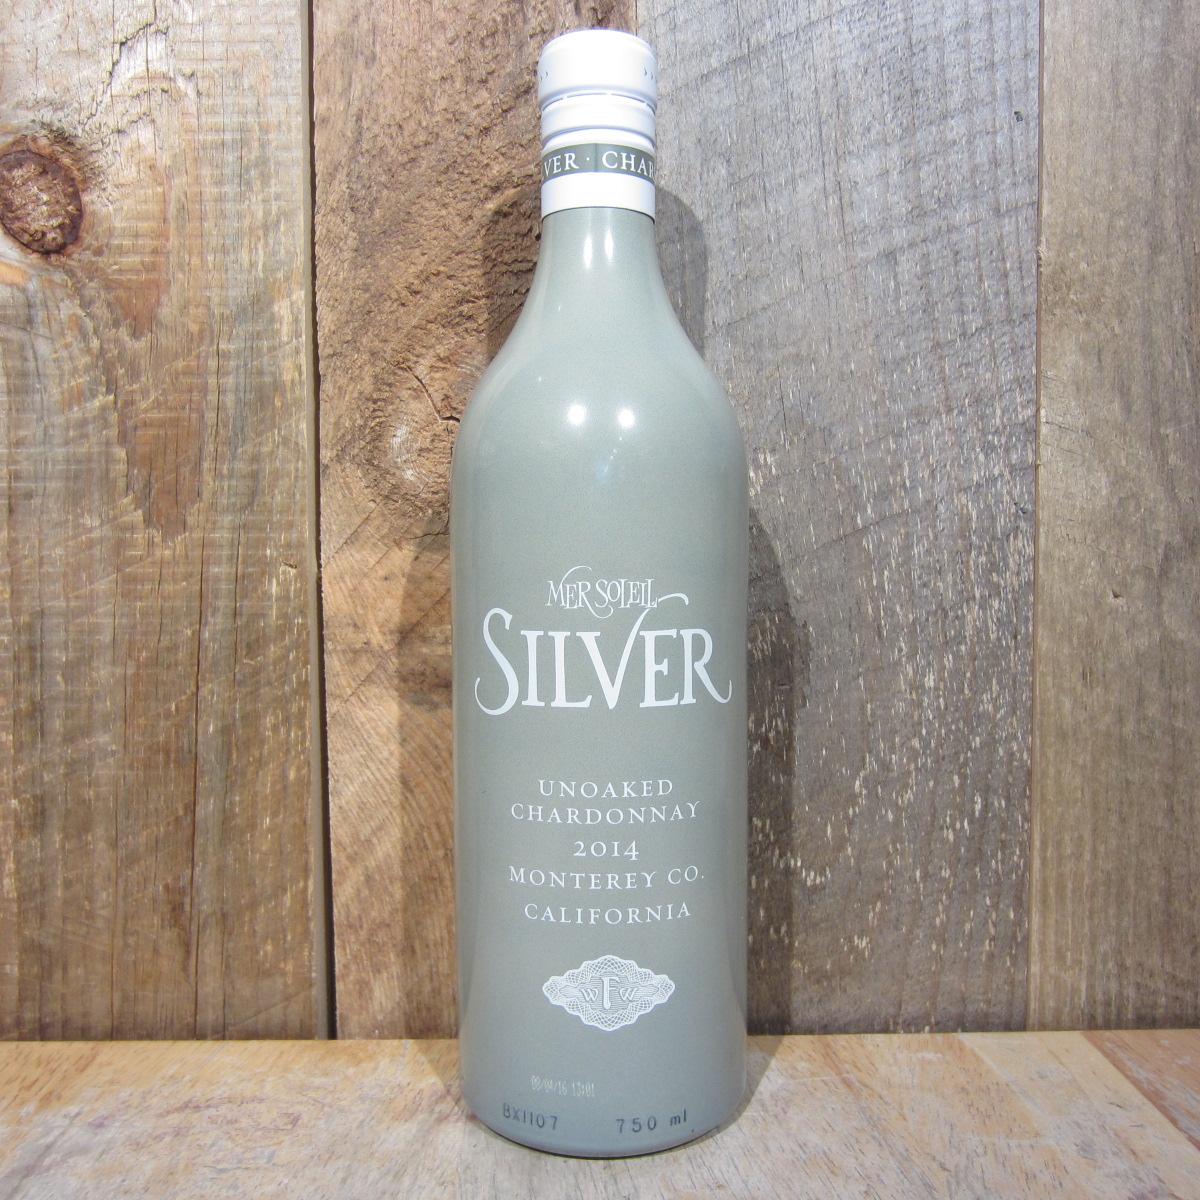 Mer Soleil Silver Unoaked Chardonnay 750ml